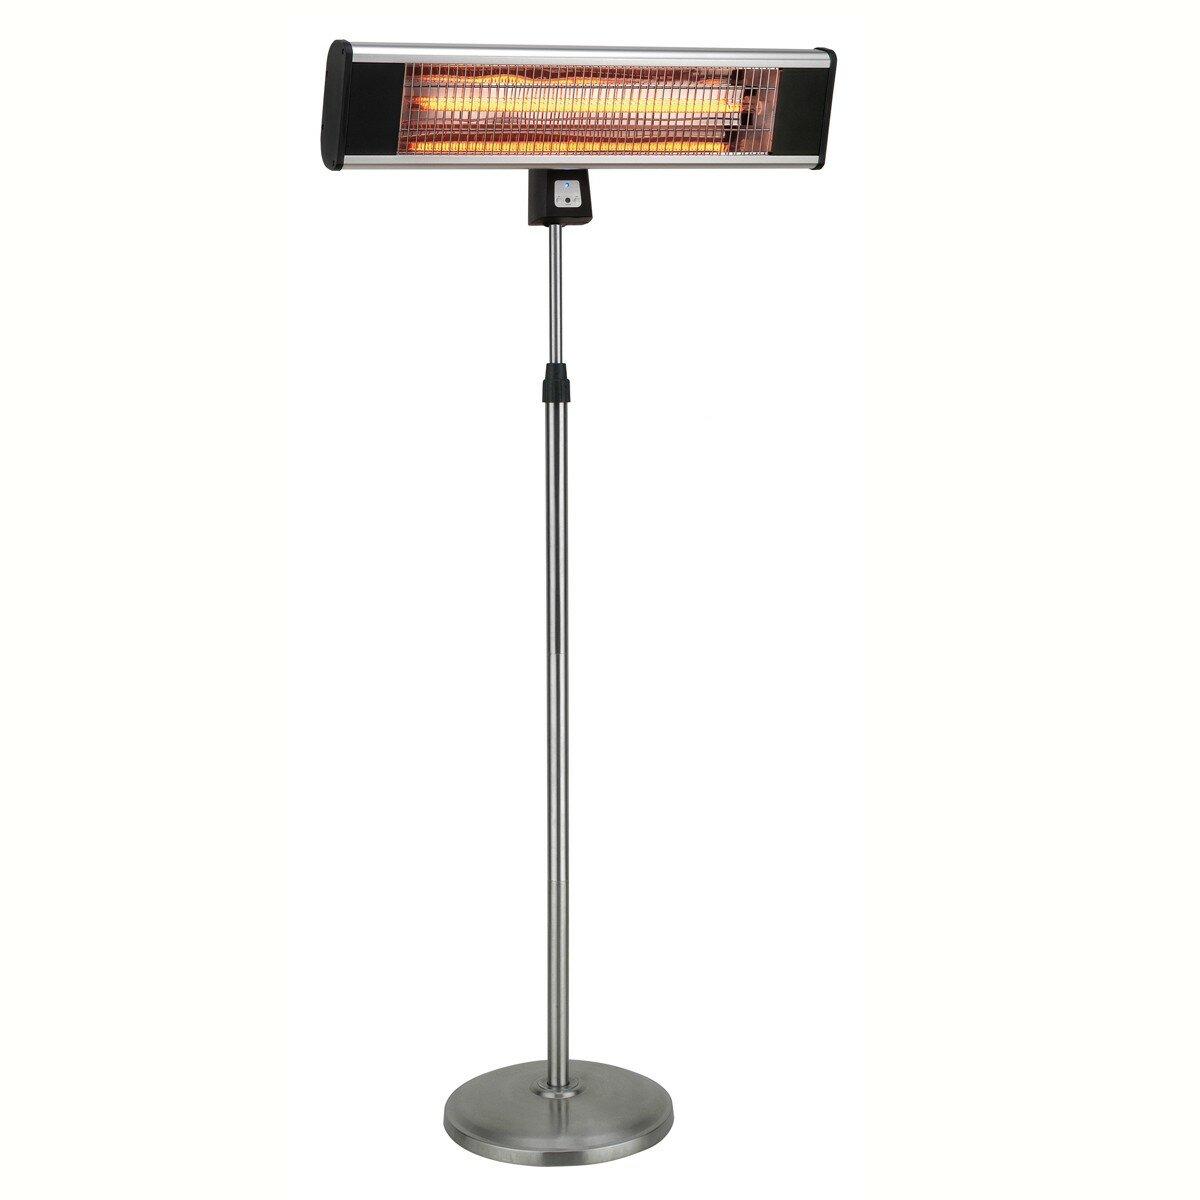 Hetr Infrared Pedestal Style 1500 Watt Electric Patio Heater   Wayfair